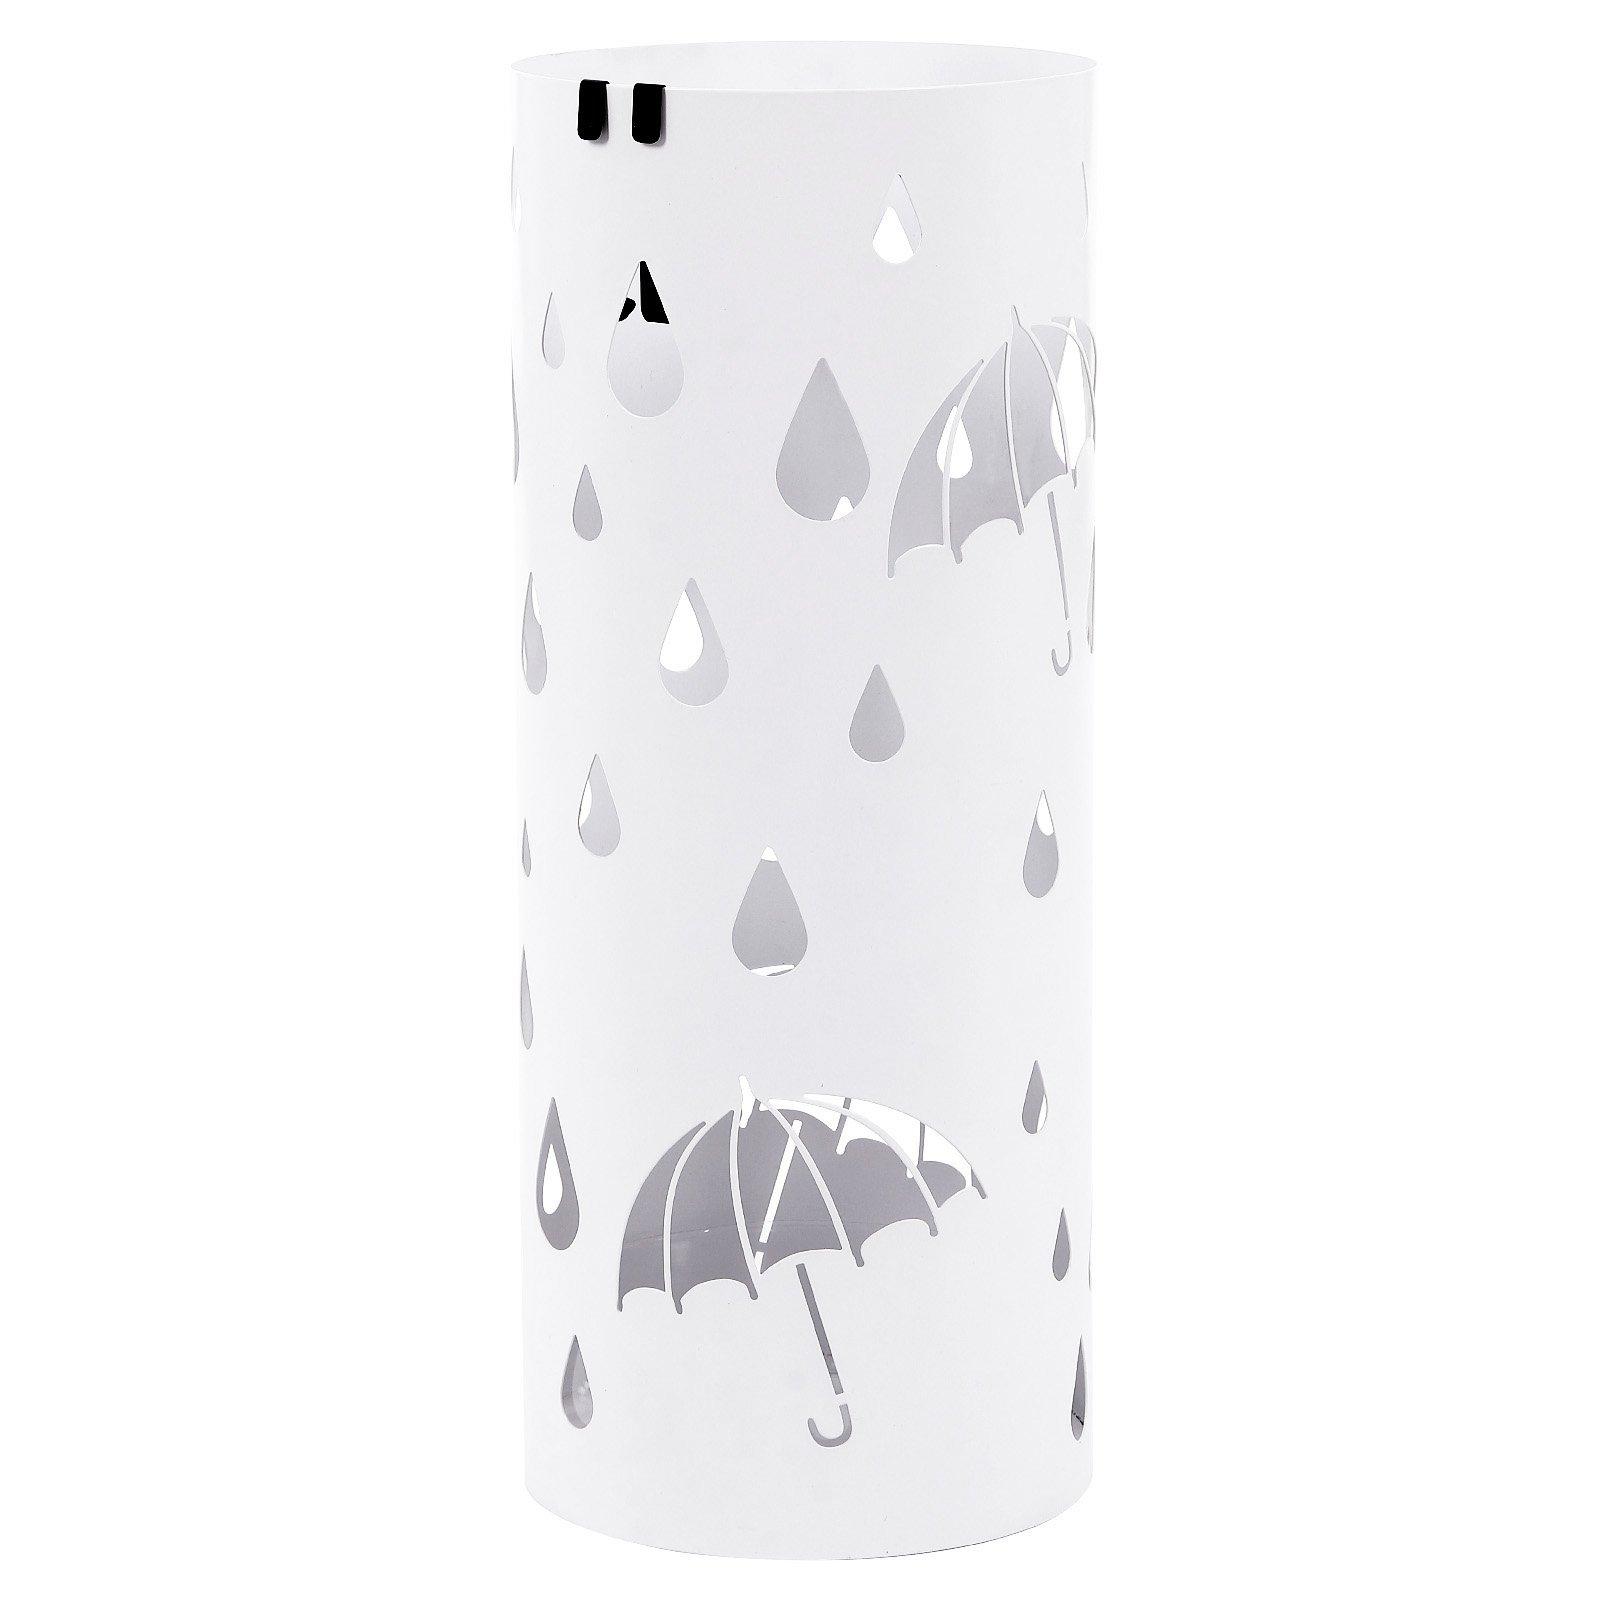 Songmics Paragüero Soporte de Paragüas umbrella stand perchero (49 x Ø19.5 cm)